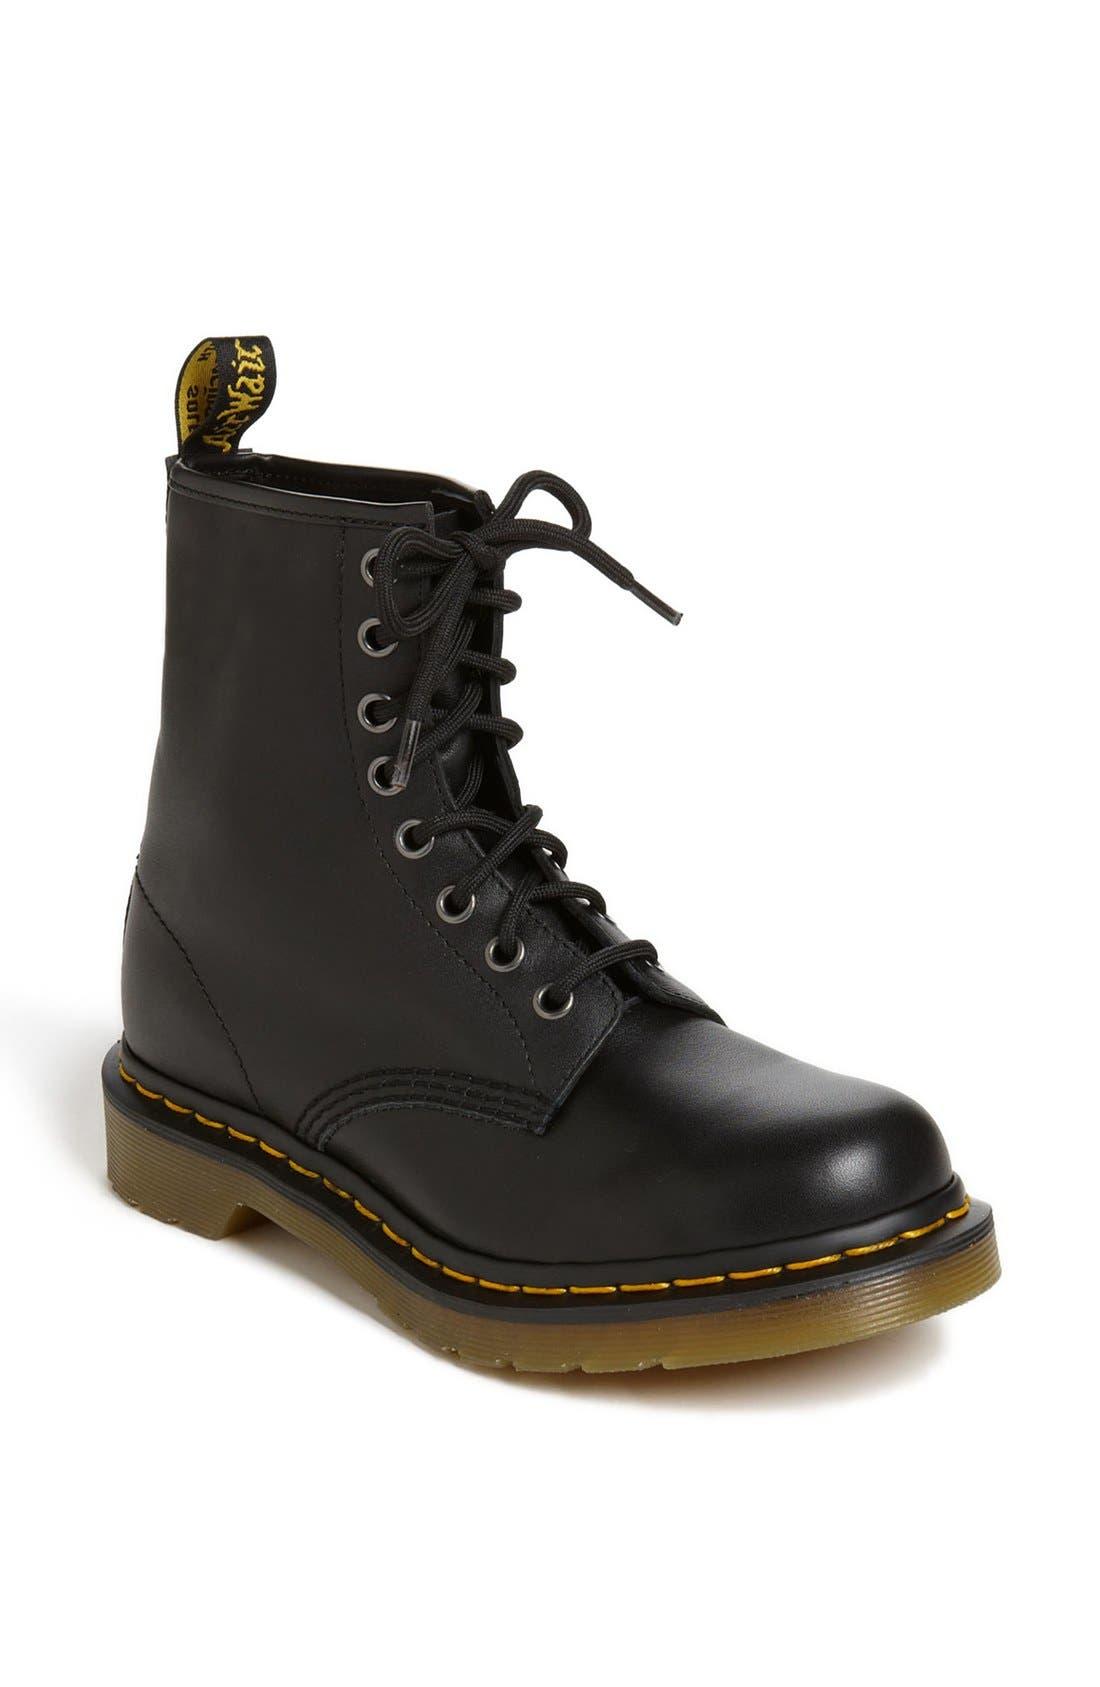 1460 W Boot,                             Main thumbnail 1, color,                             002